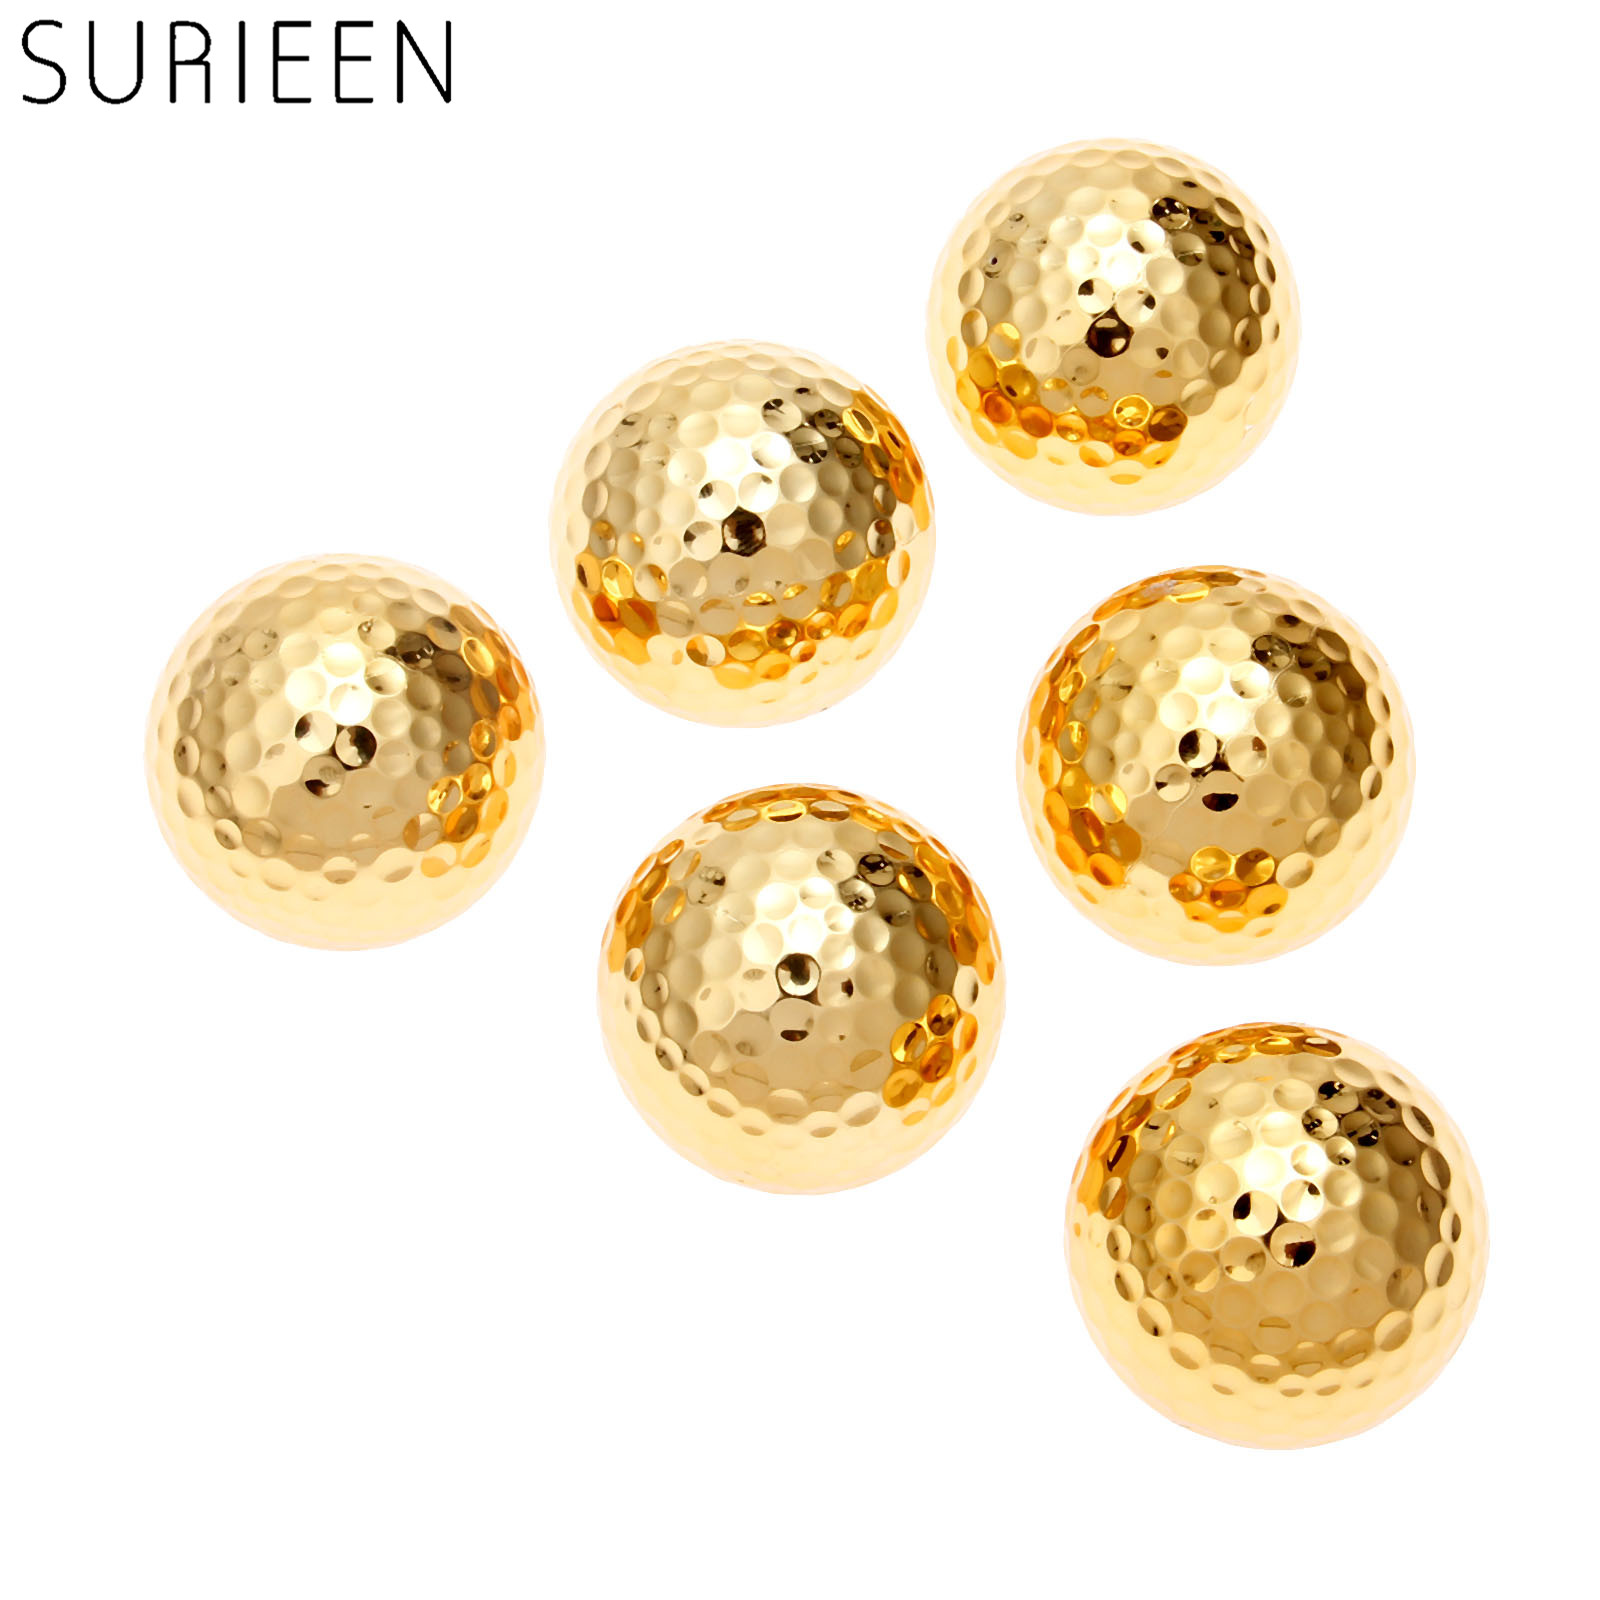 6 Pcs/lot Two Layer Golden Golf Balls Golf Practice Balls Golfer Training Gift Ball 42.67mm Indoor & Outdoor Sports Balls Games